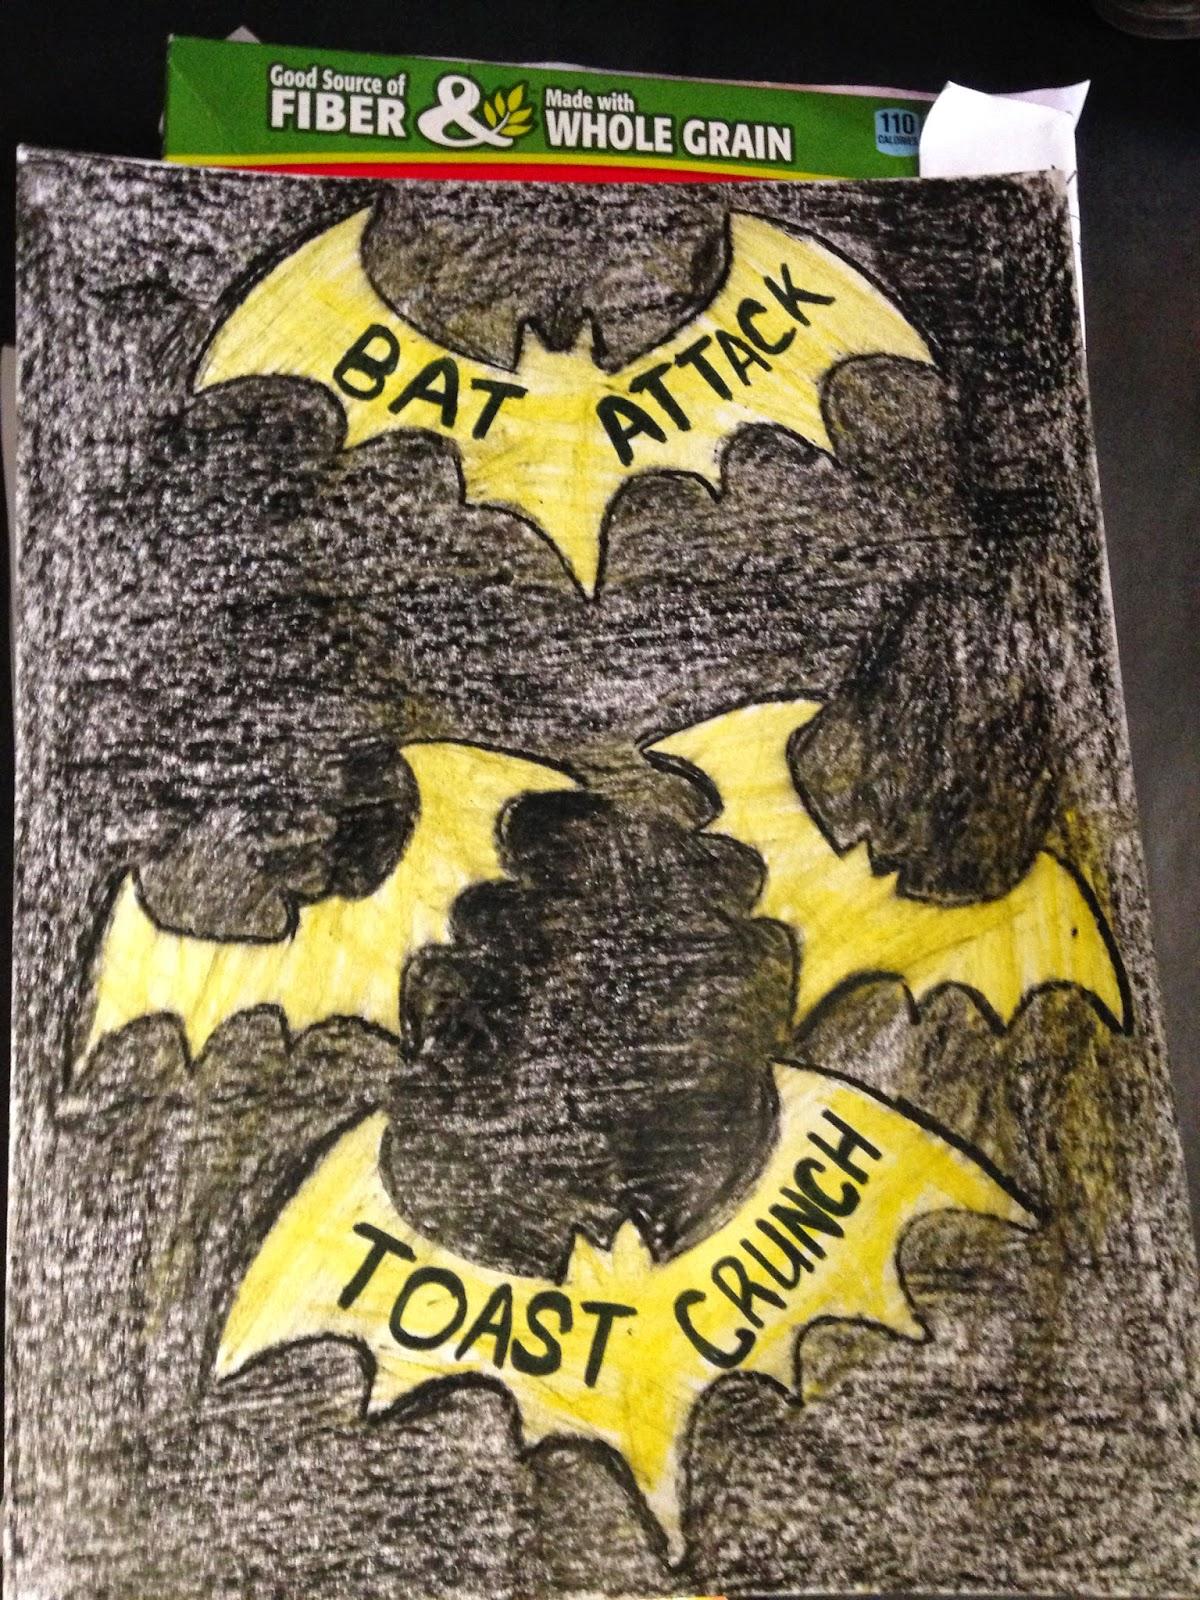 the corriganite nation  bat cereal boxes